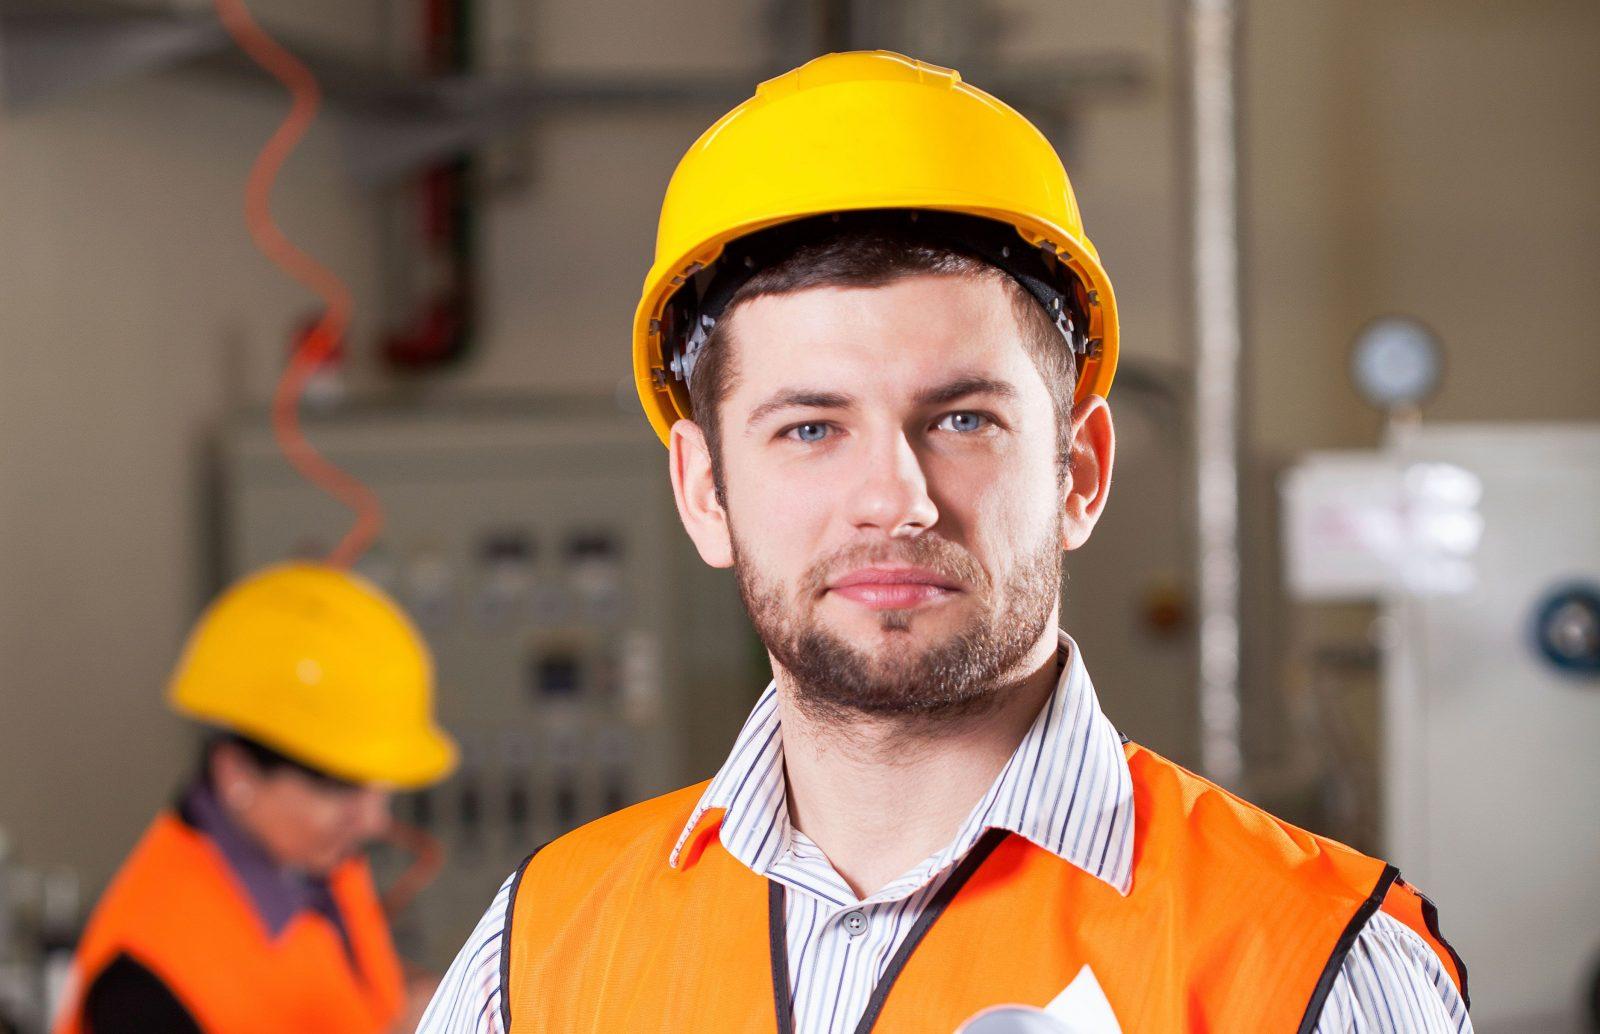 Man in hard hat in industrial factory